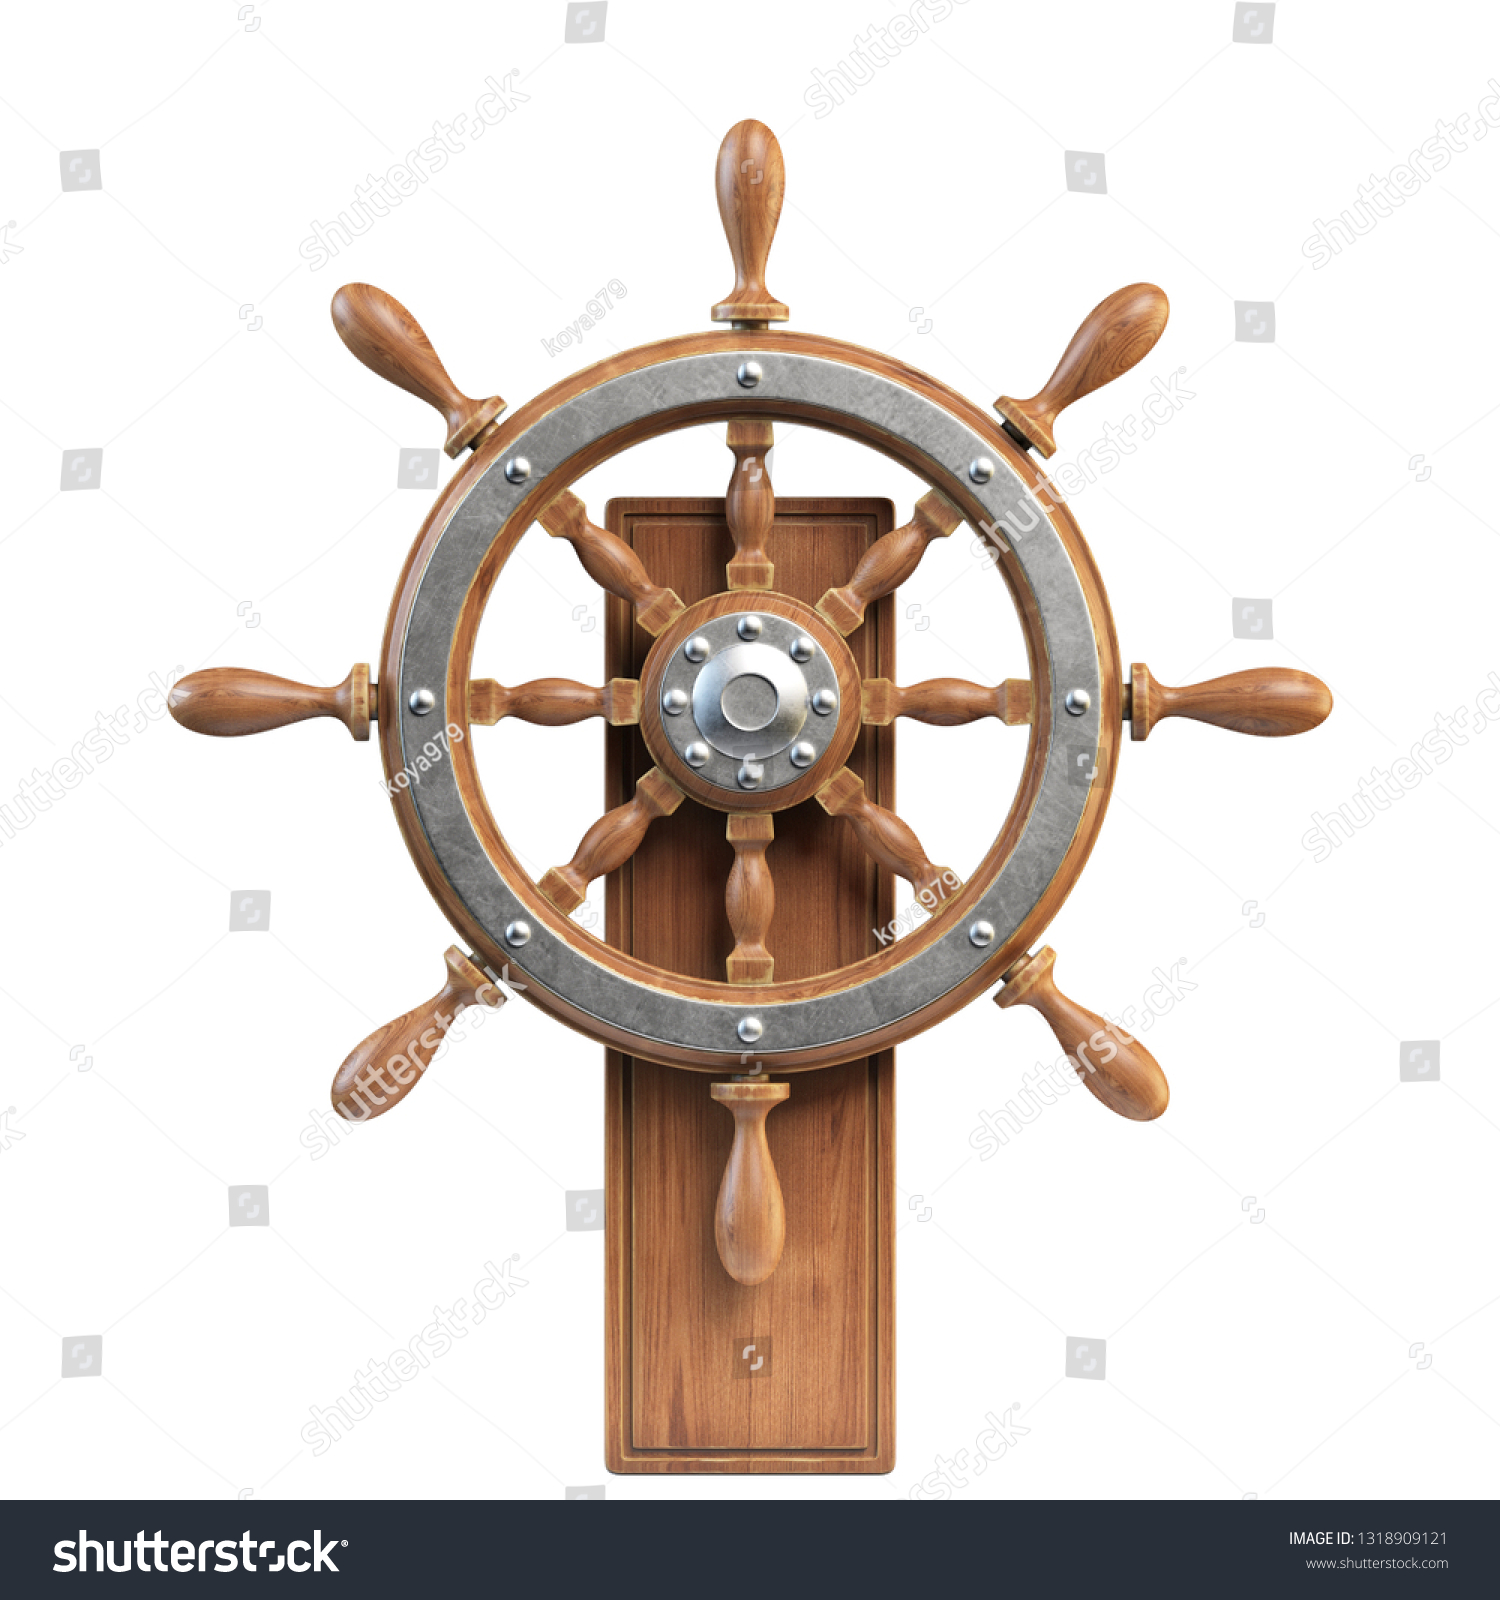 Ilustracoes Stock Imagens E Vetores De Ship Wheel Stand Isolated On White 1318909121